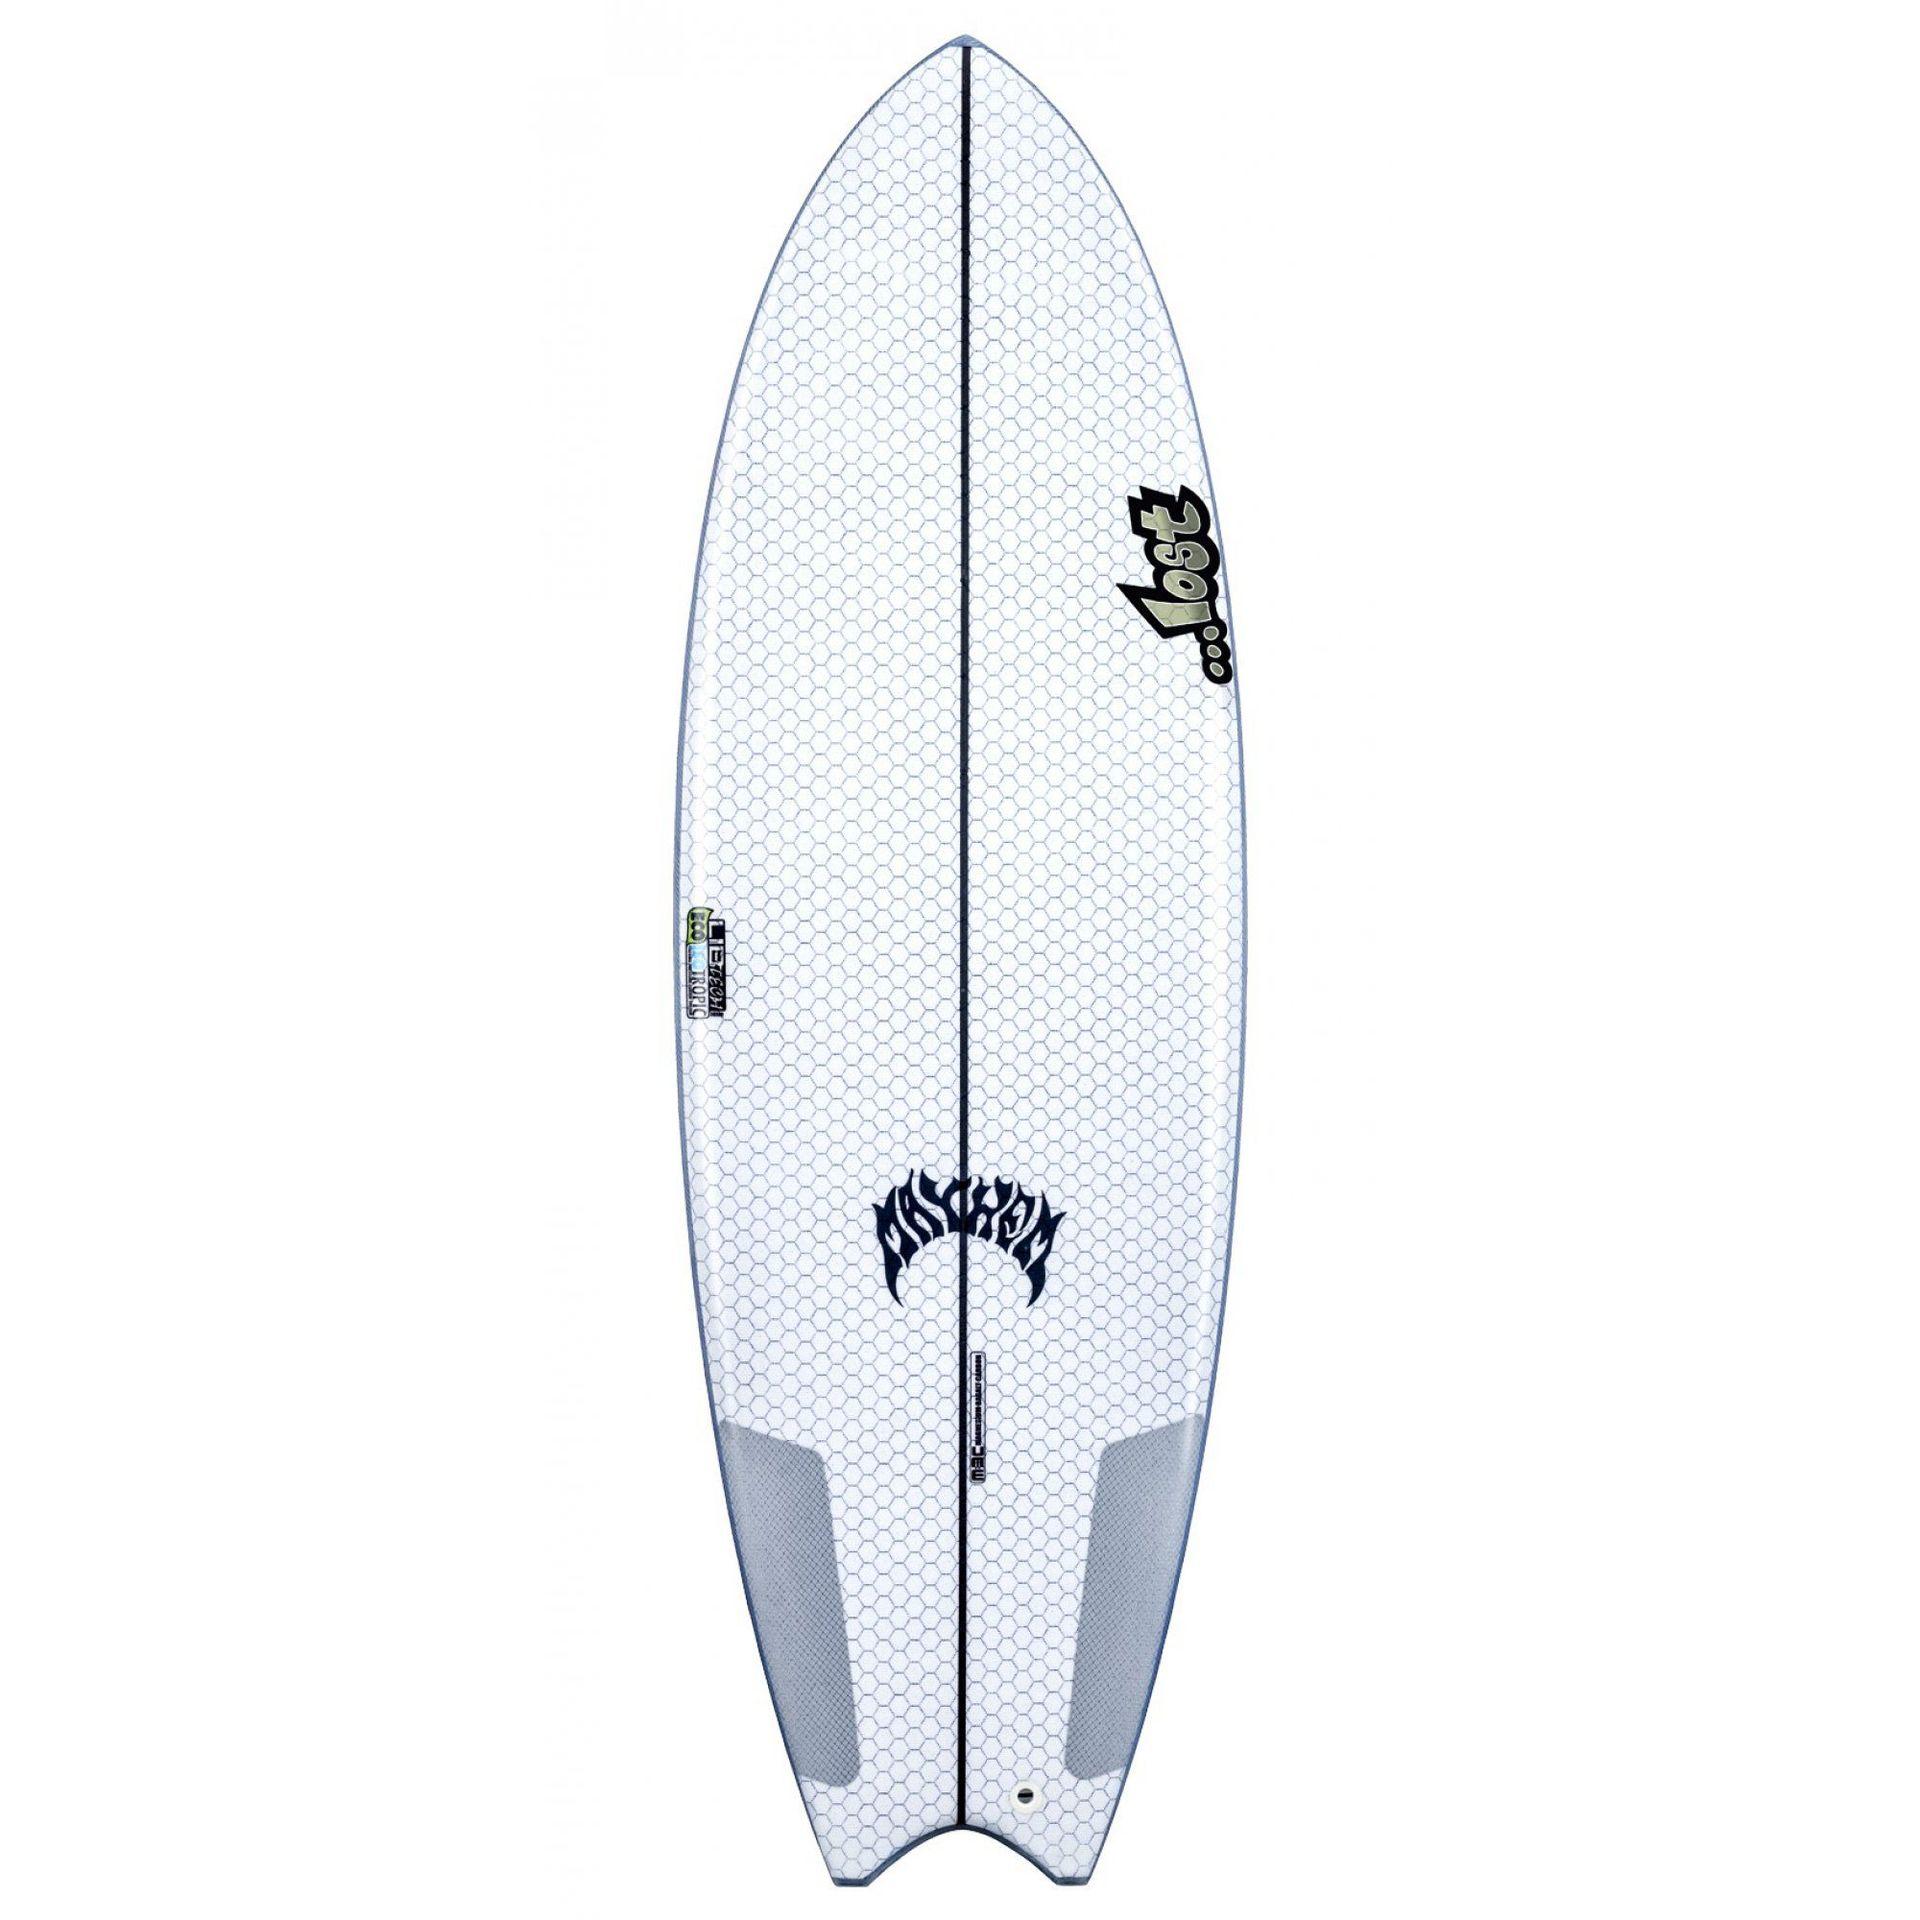 DESKA SURFINGOWA LIB TECH LOST PUDDLE FISH 1